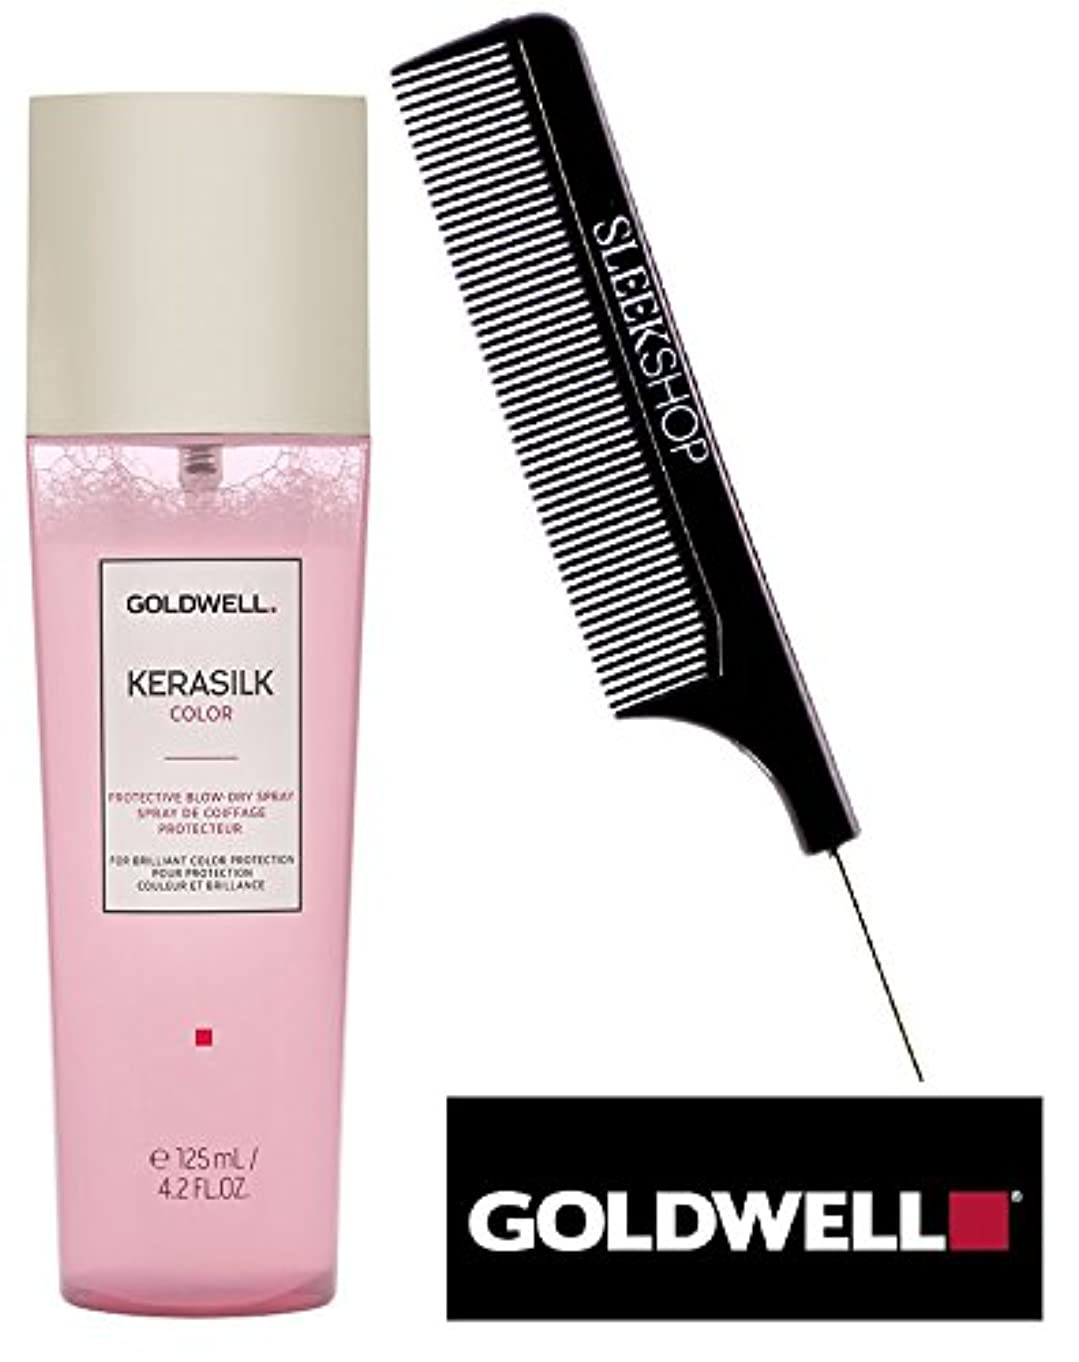 Goldwell Kerasilk COLOR保護は)((流線型スチールピンテール櫛で)鮮やかな色の保護のためにドライスプレーを吹き 4.2オンス/ 125ミリリットル